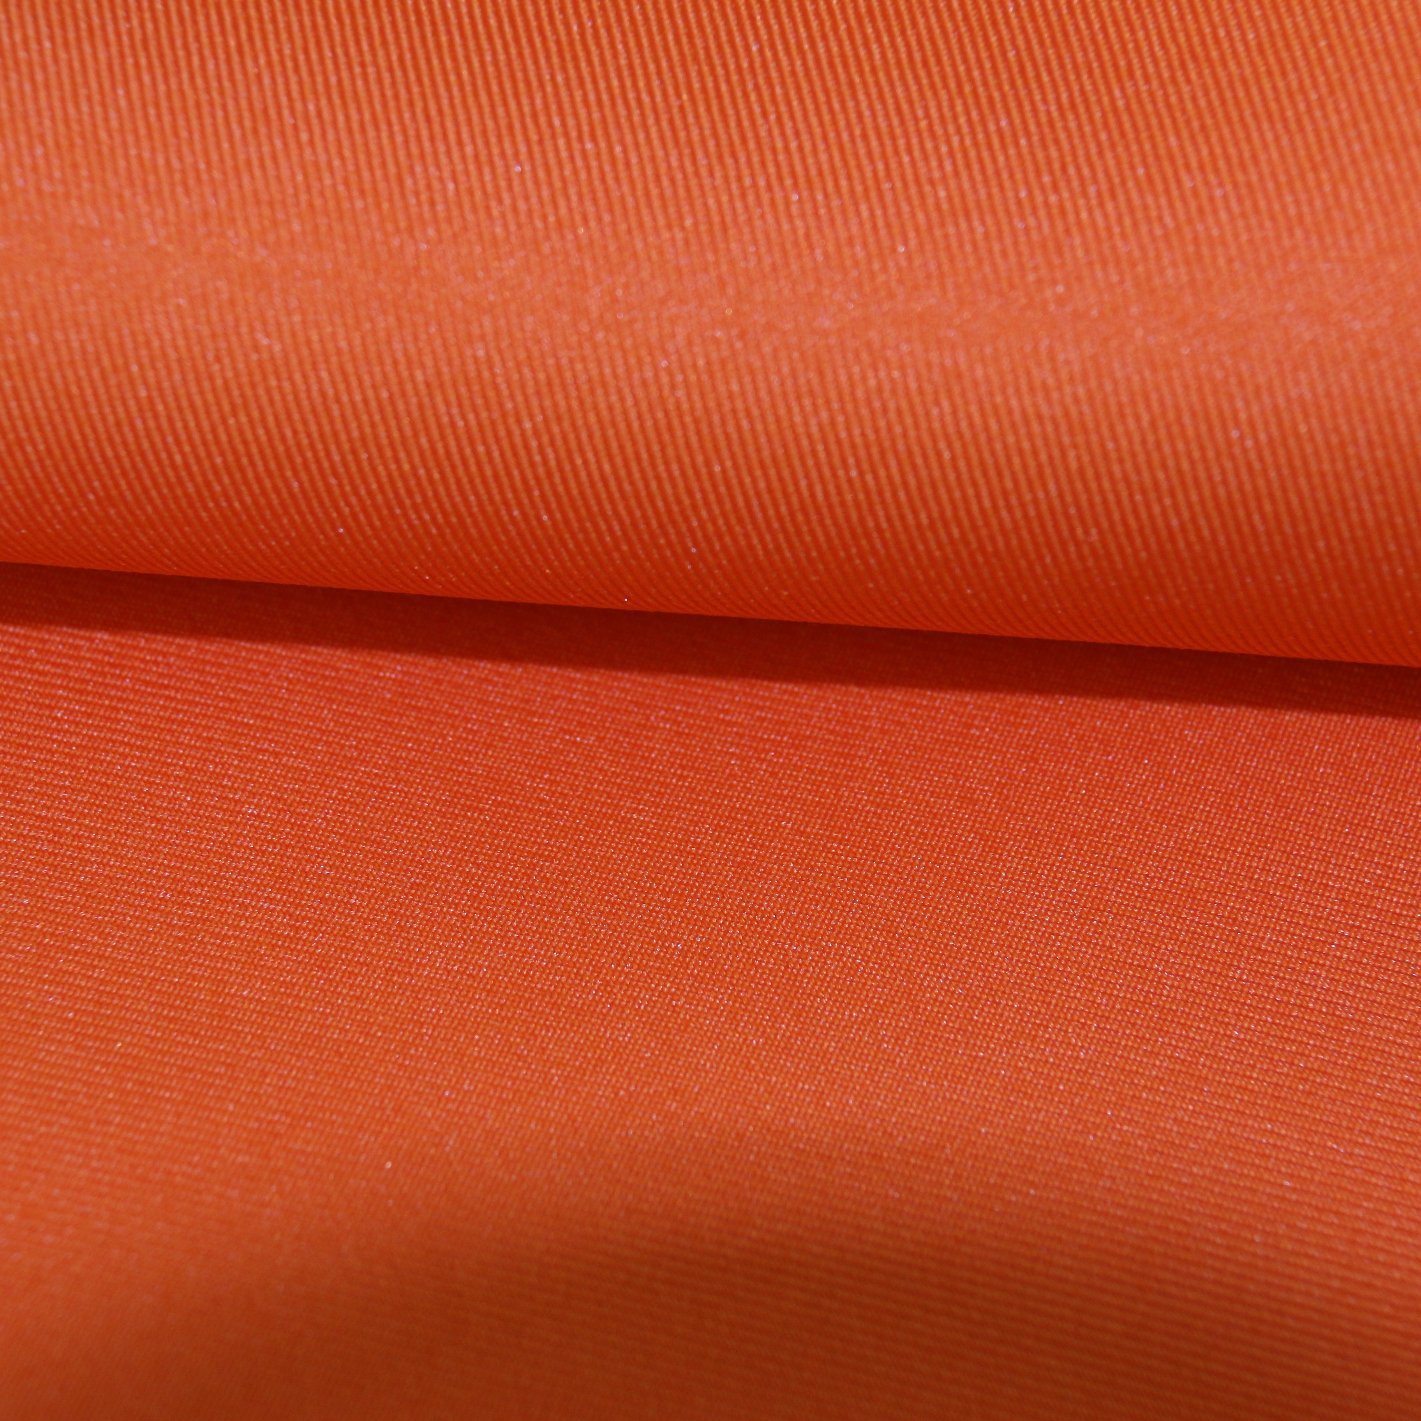 Polyester Fabric 2/2 Twill 150d*300d Gaberdine for Workwear Uniform Fabric